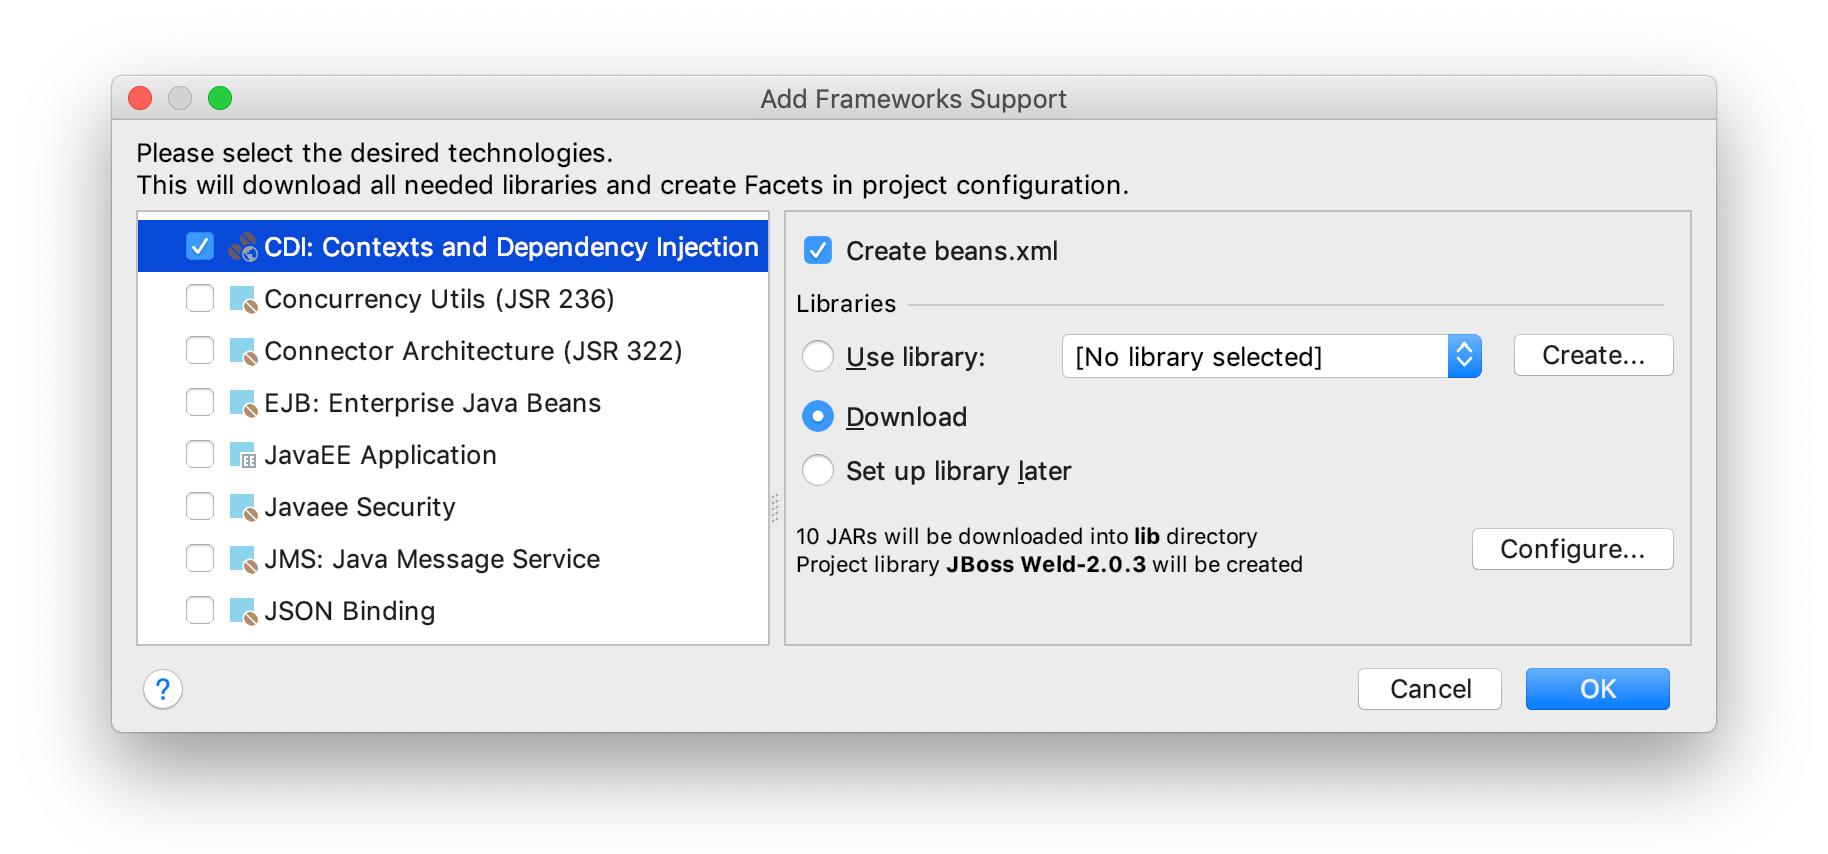 Java jms jar download